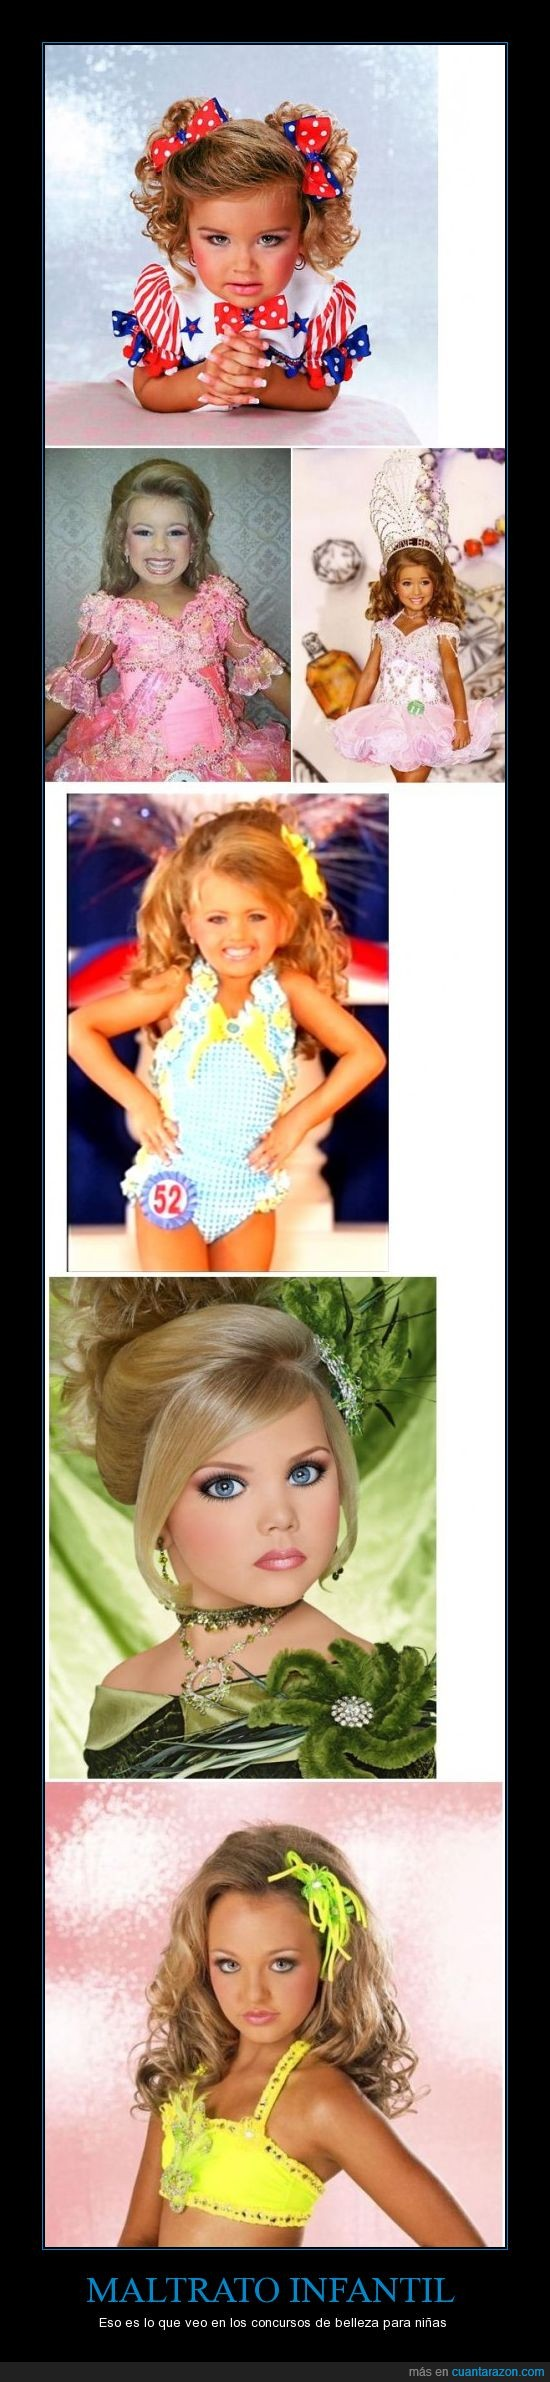 concursos de belleza,maltrato infantil